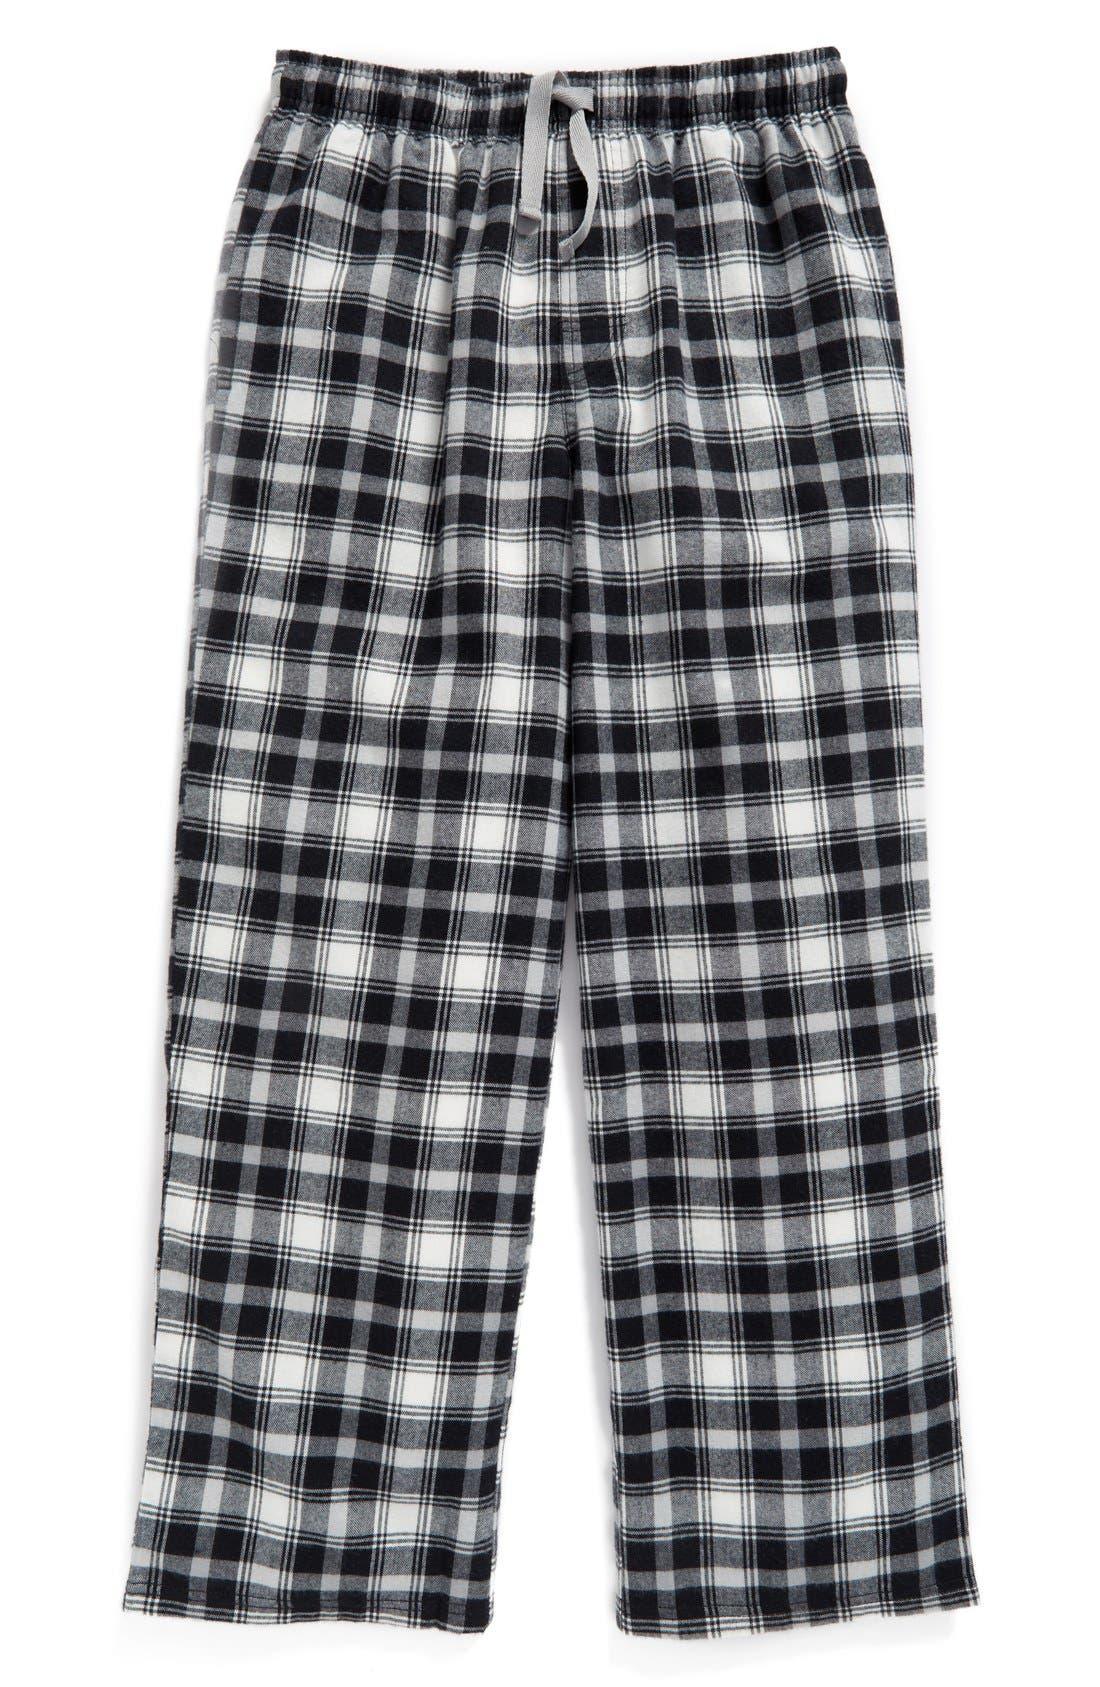 Alternate Image 1 Selected - Tucker + Tate Flannel Pajama Pants (Little Boys & Big Boys)